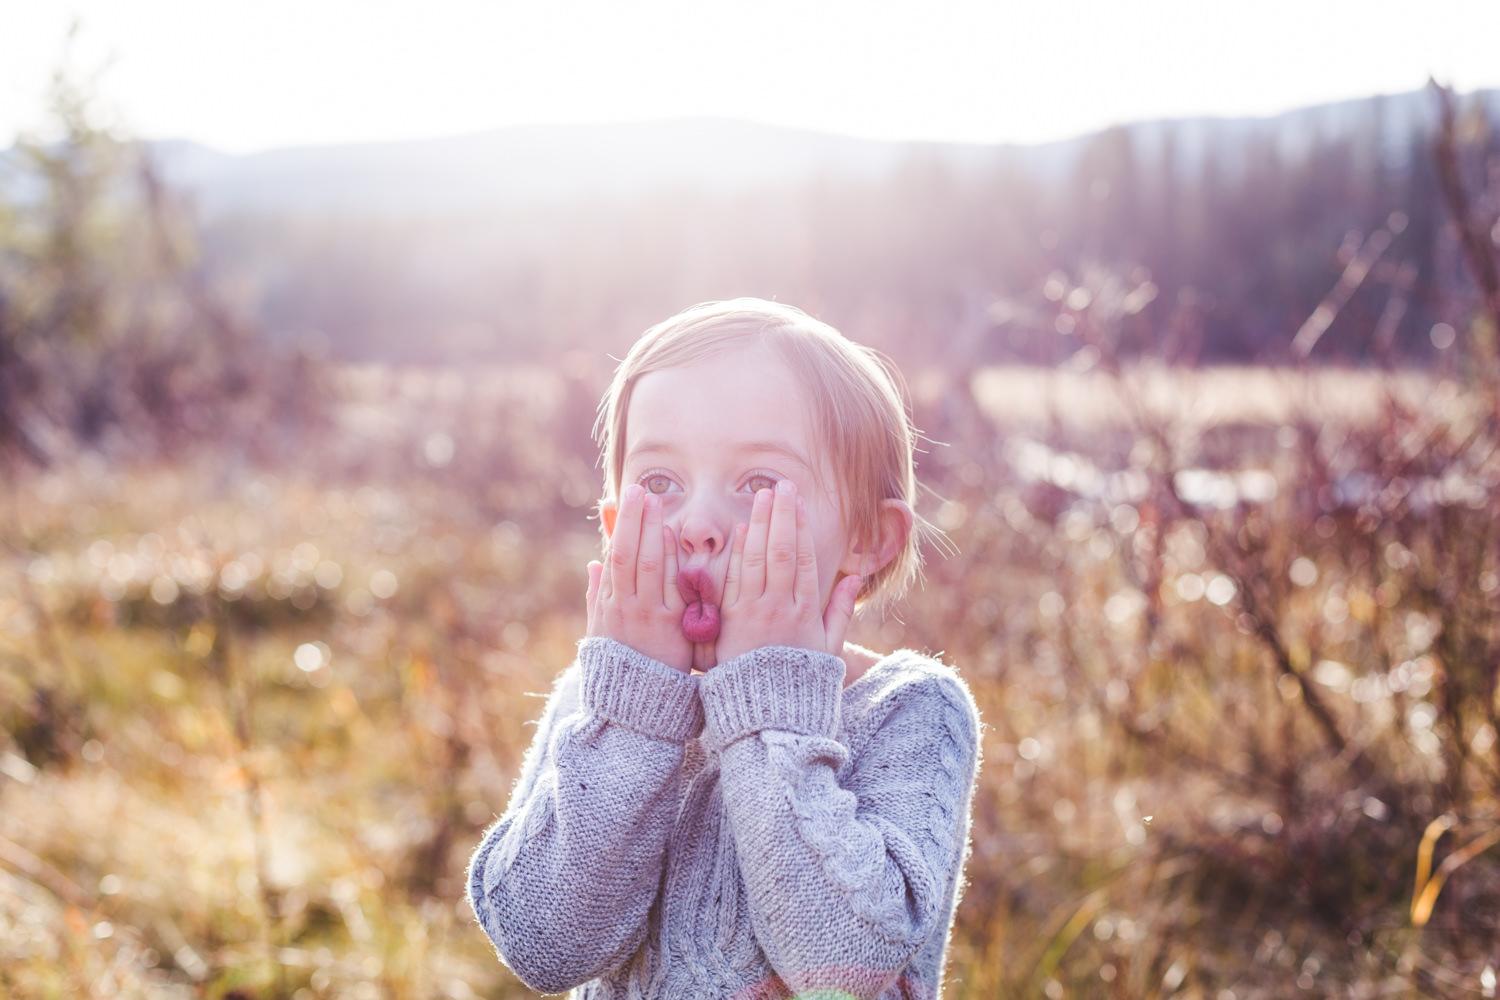 kelowna-outdoor-family-photography-family-advernture-photographers-okanagan-bc-kids-photos-julie-dorge (49 of 58).jpg